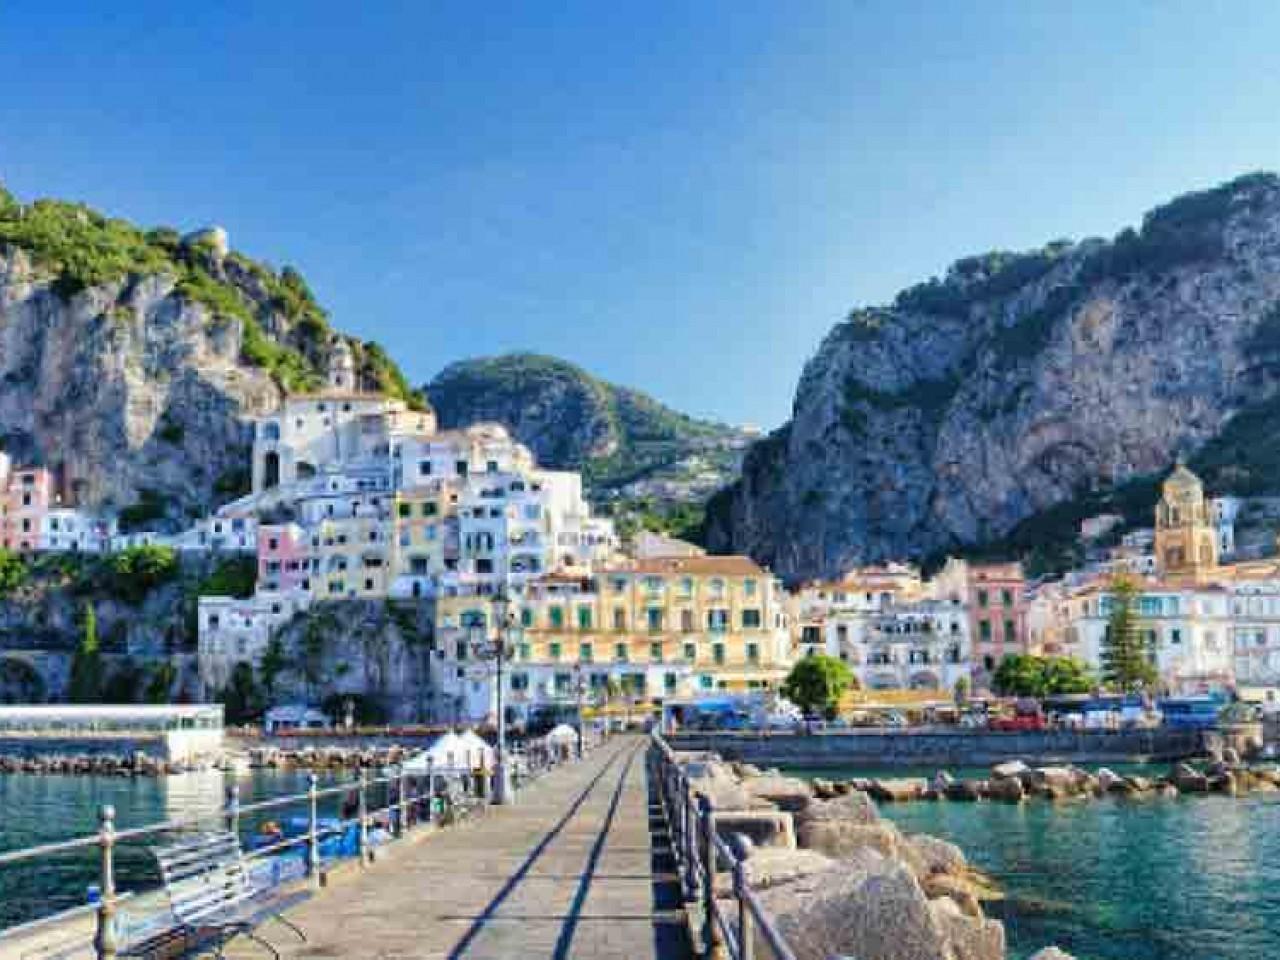 GRUPPI: Le Tre Perle Mediterranee: Paestum, Amalfi e..